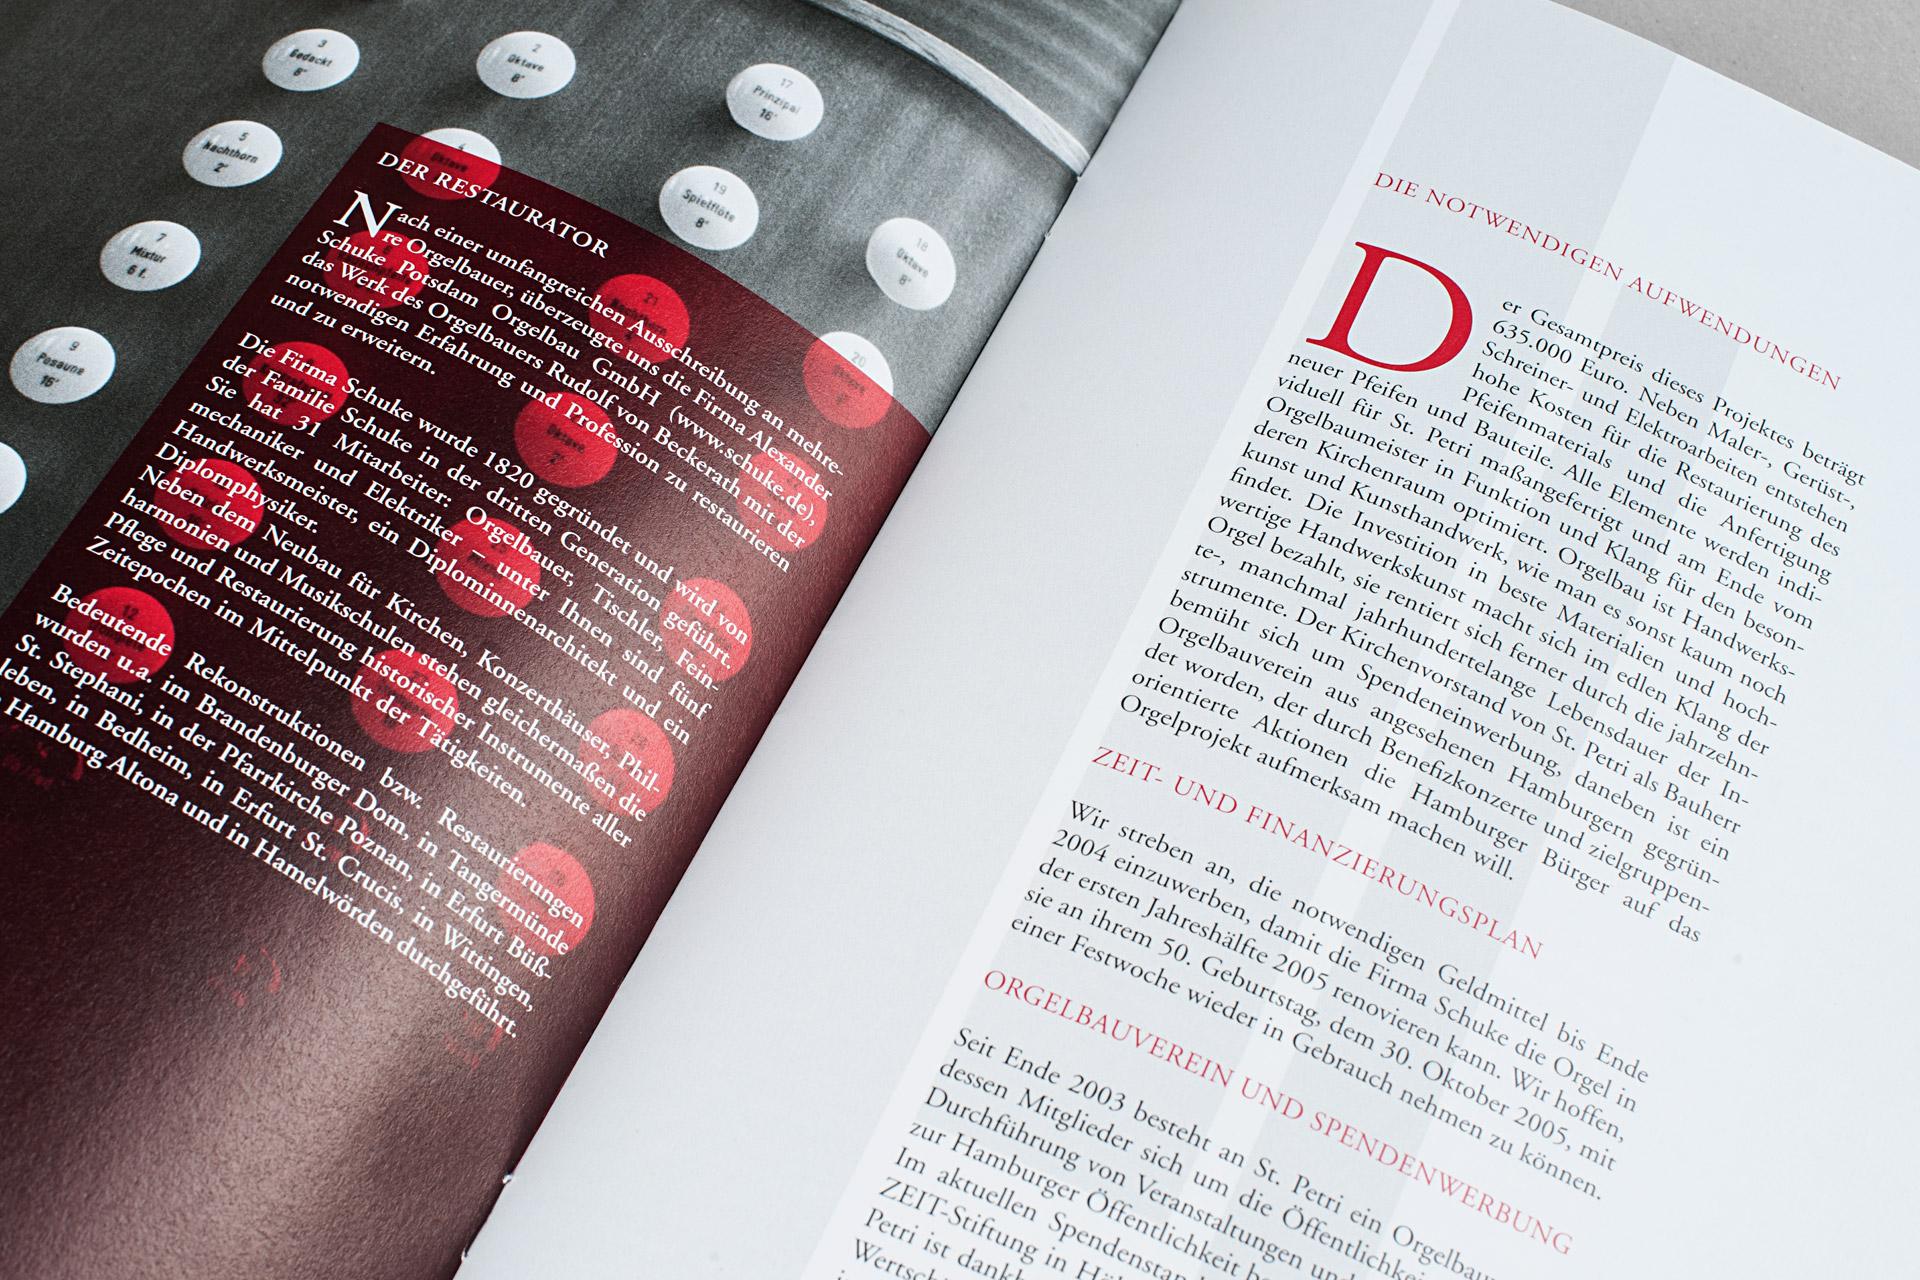 orgelprojekt-corporate-design broschuere